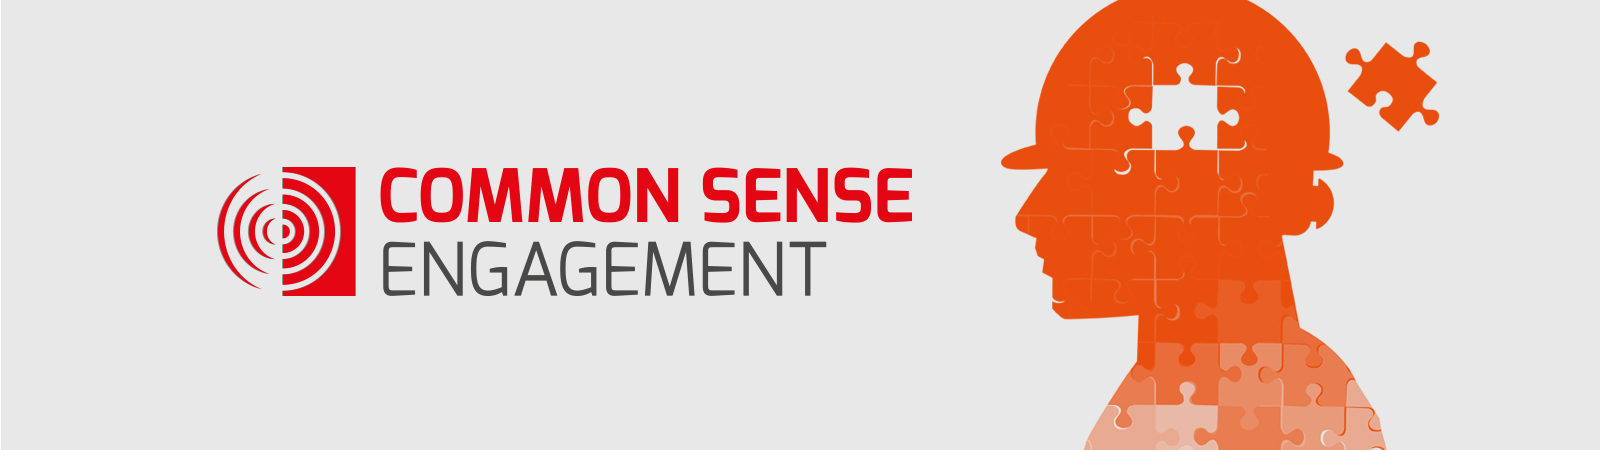 TRAD Scaffolding Common Sense Engagement